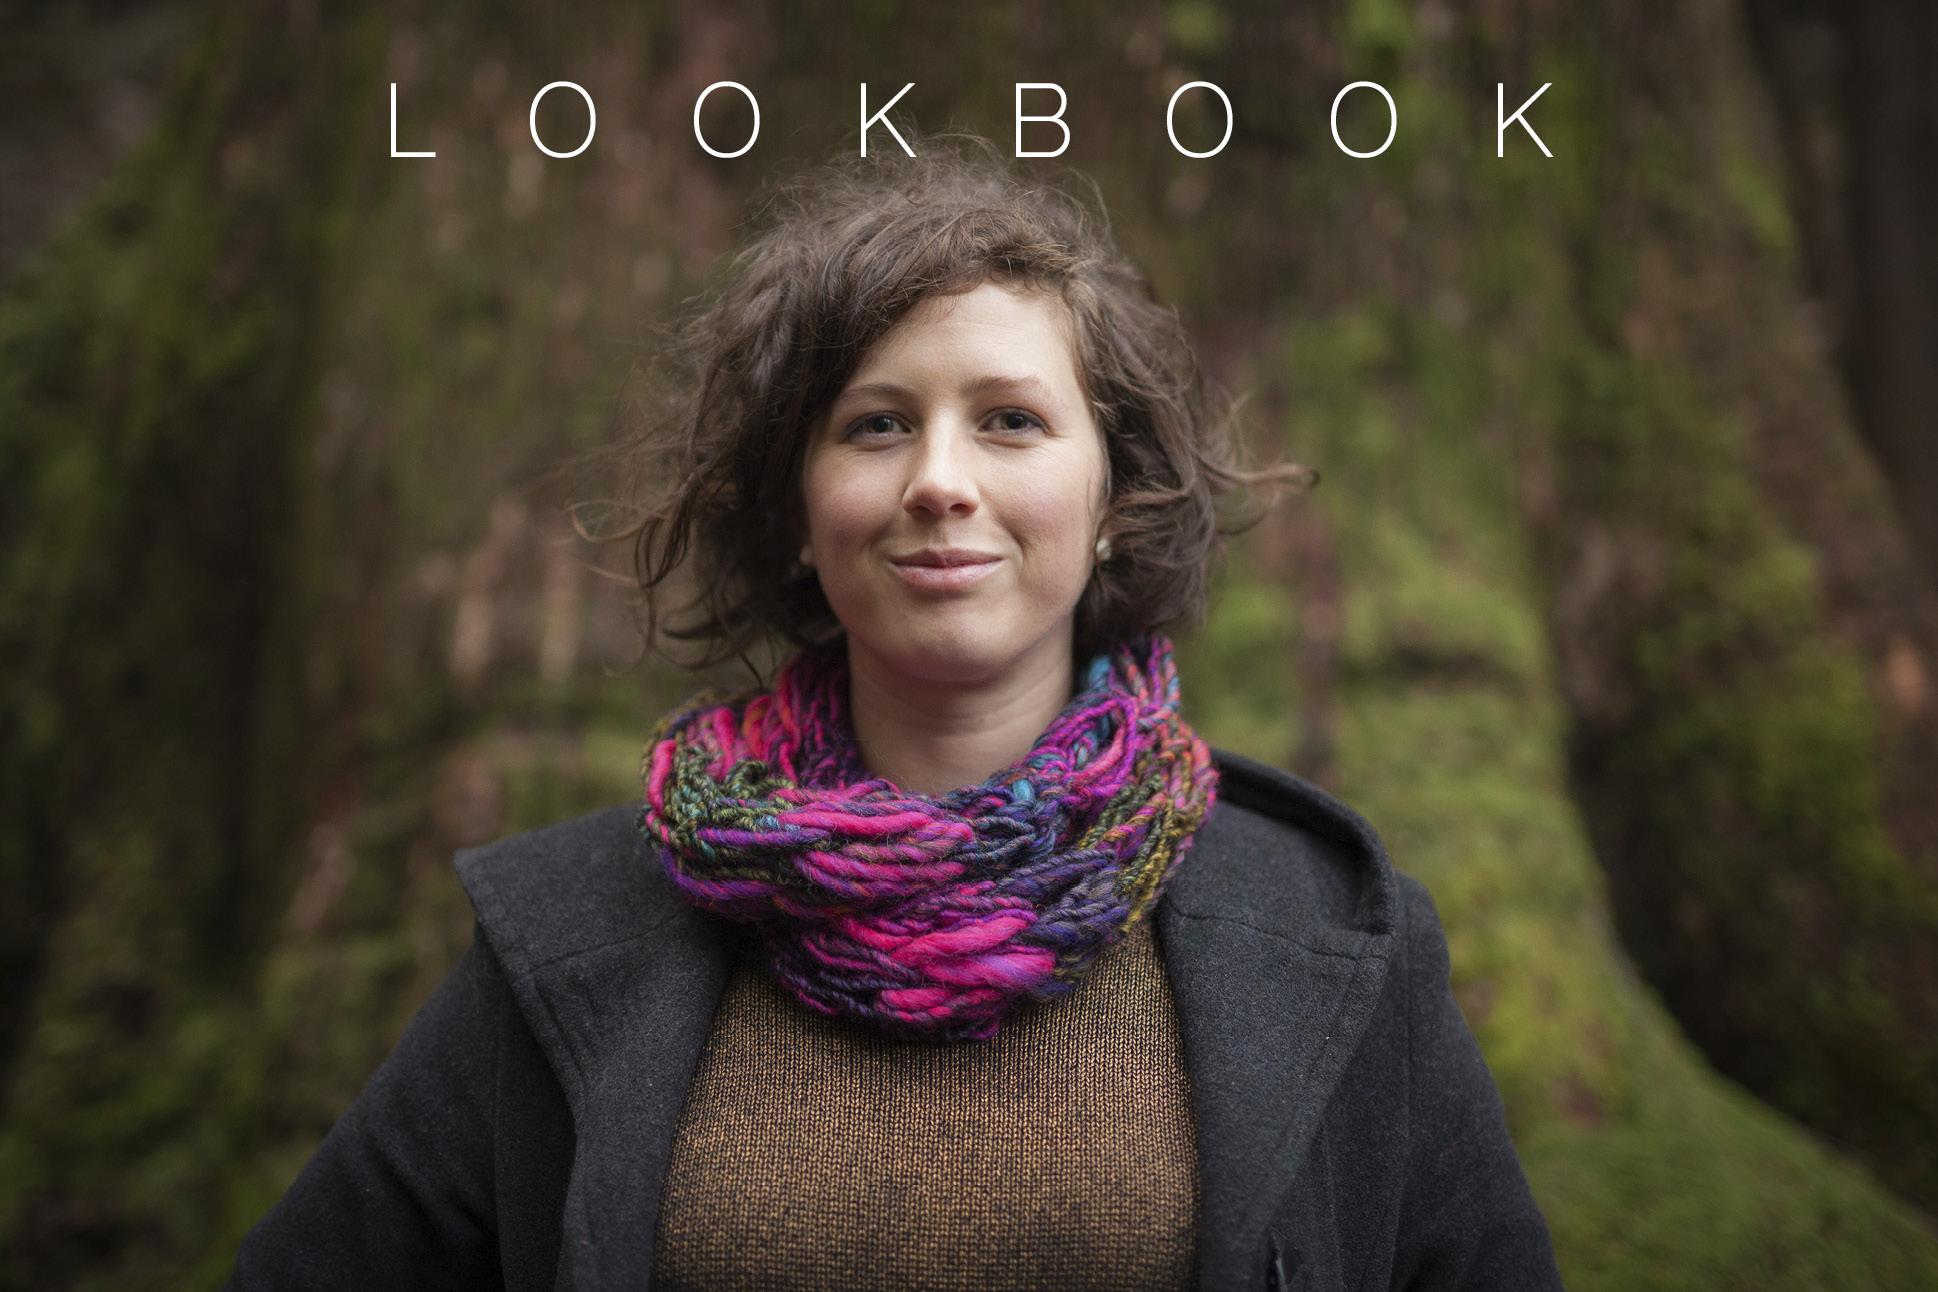 lookbook coverplain.jpg